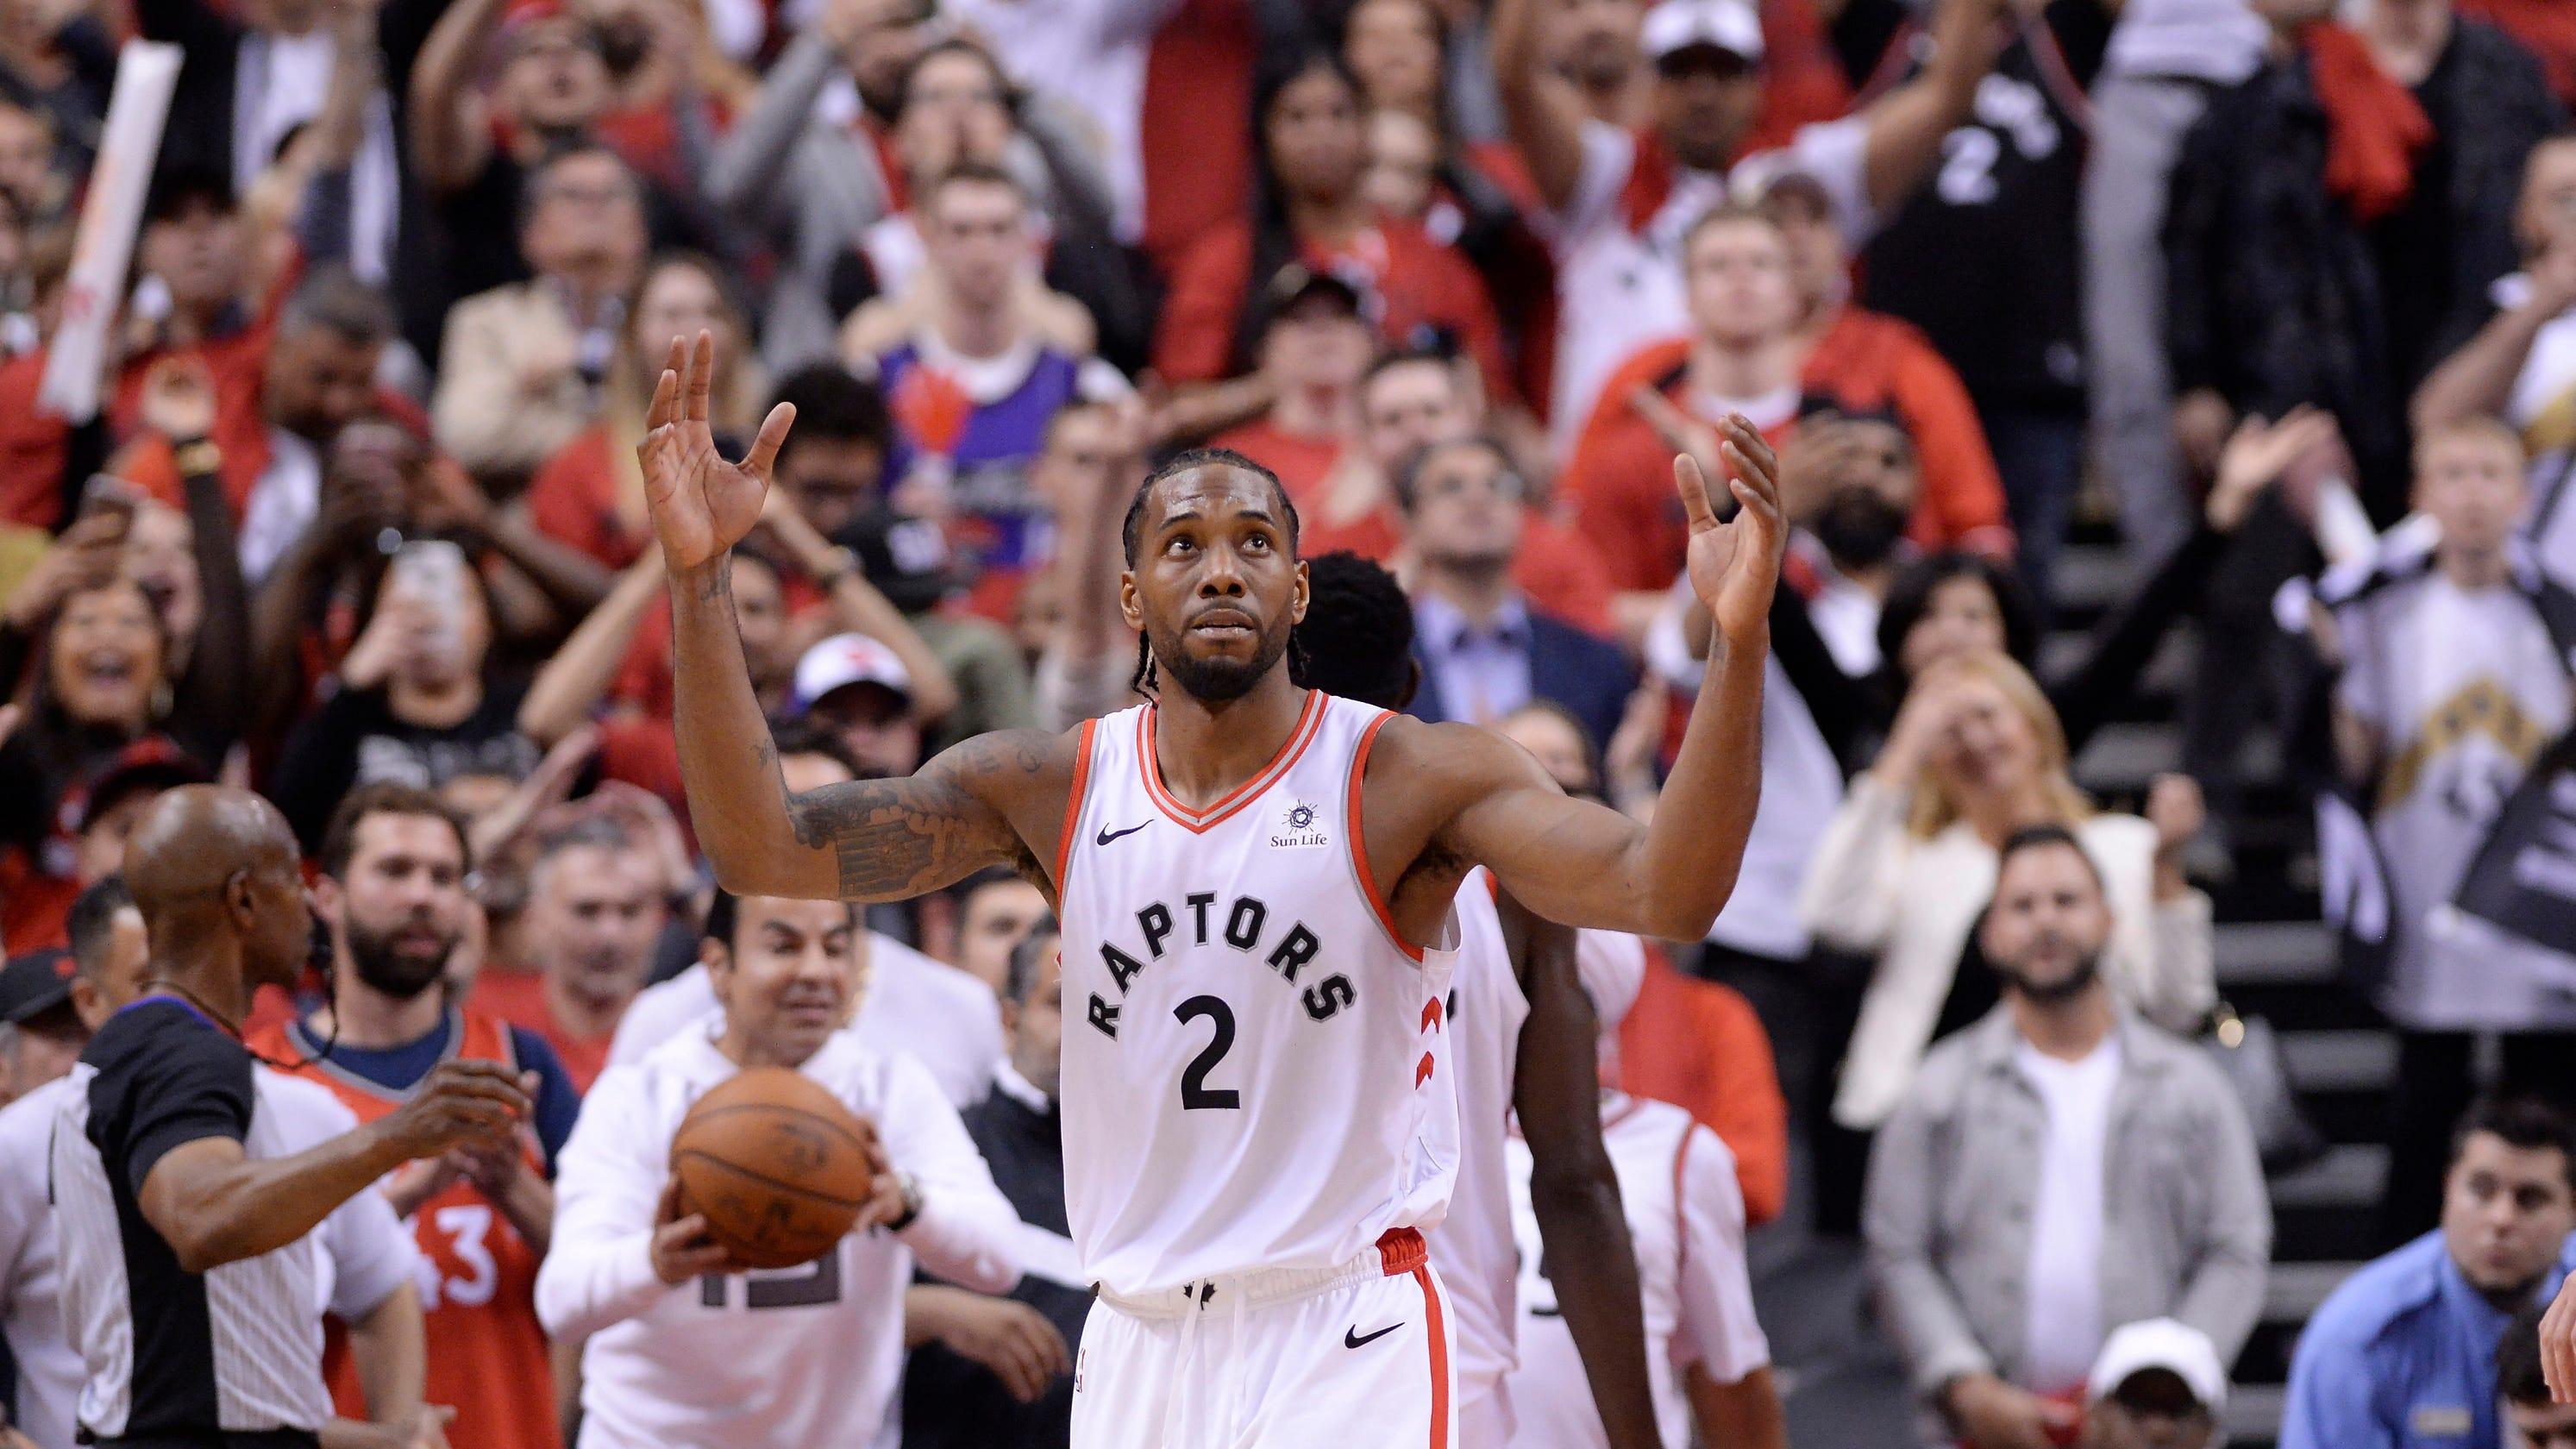 064c2e0a4 Sunday s NBA playoffs  Kawhi Leonard scores 36